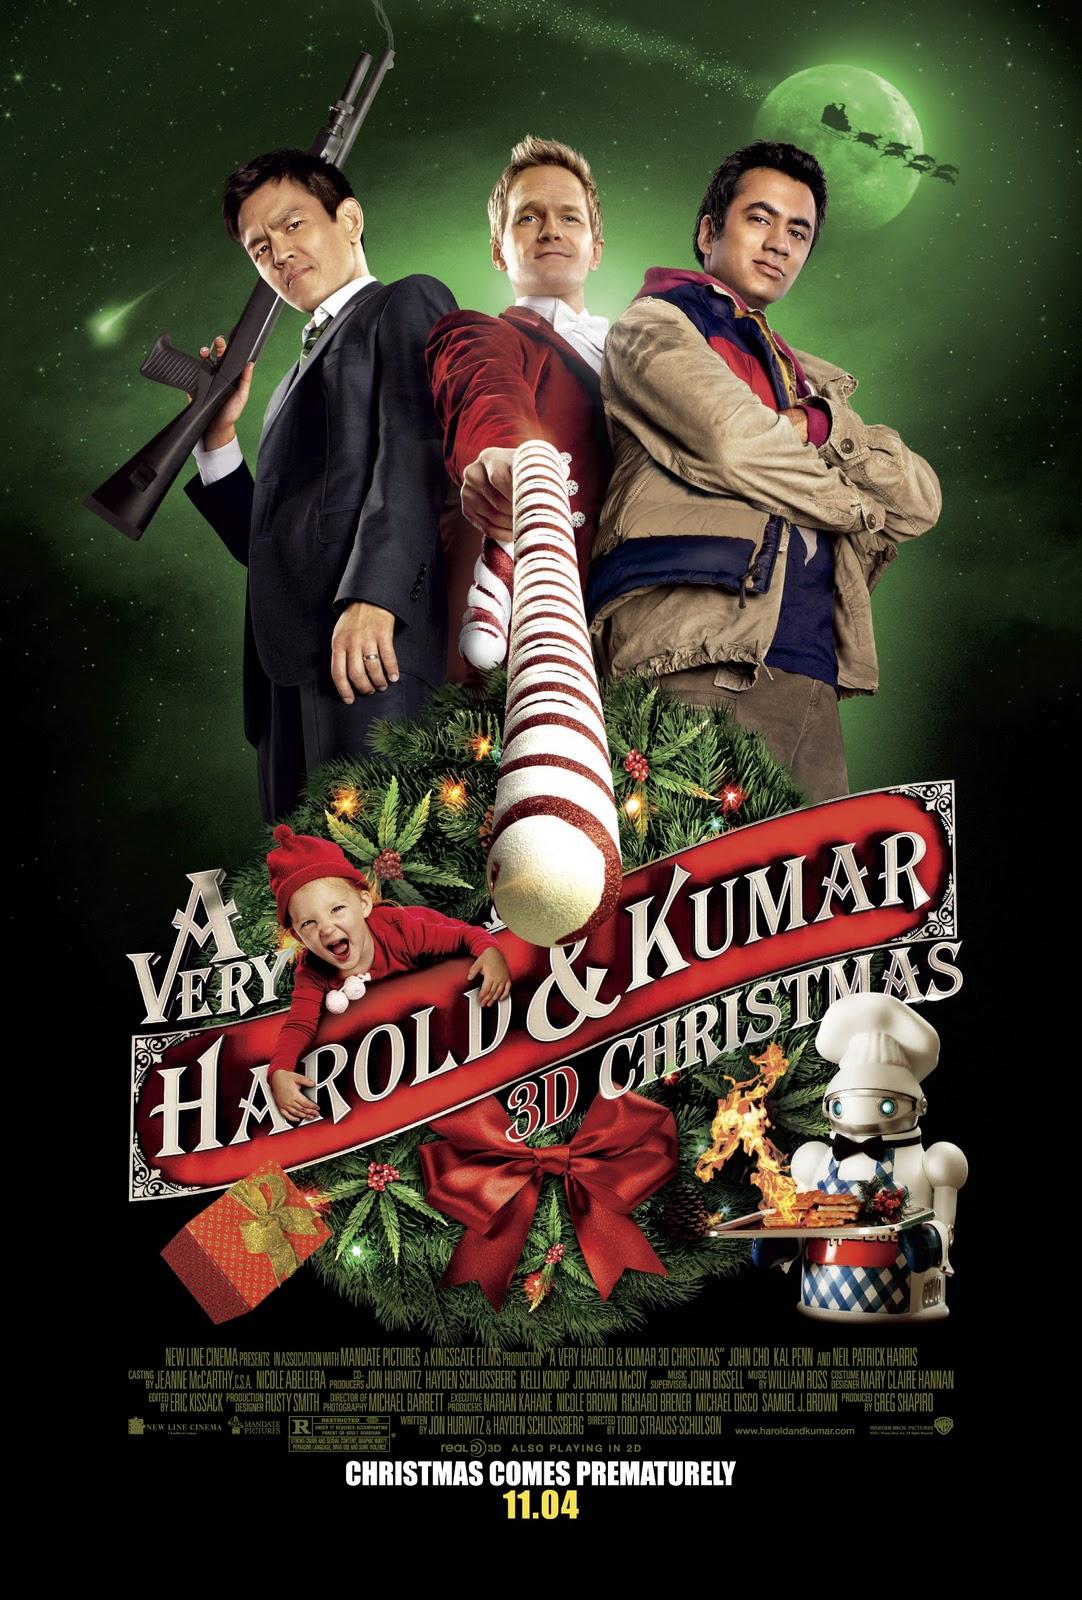 http://2.bp.blogspot.com/-9hztu4E5rUI/TrlasHIw9UI/AAAAAAAAAOo/s0NDPTbBZG4/s1600/very-harold-kumar-christmas-movie-poster.jpg